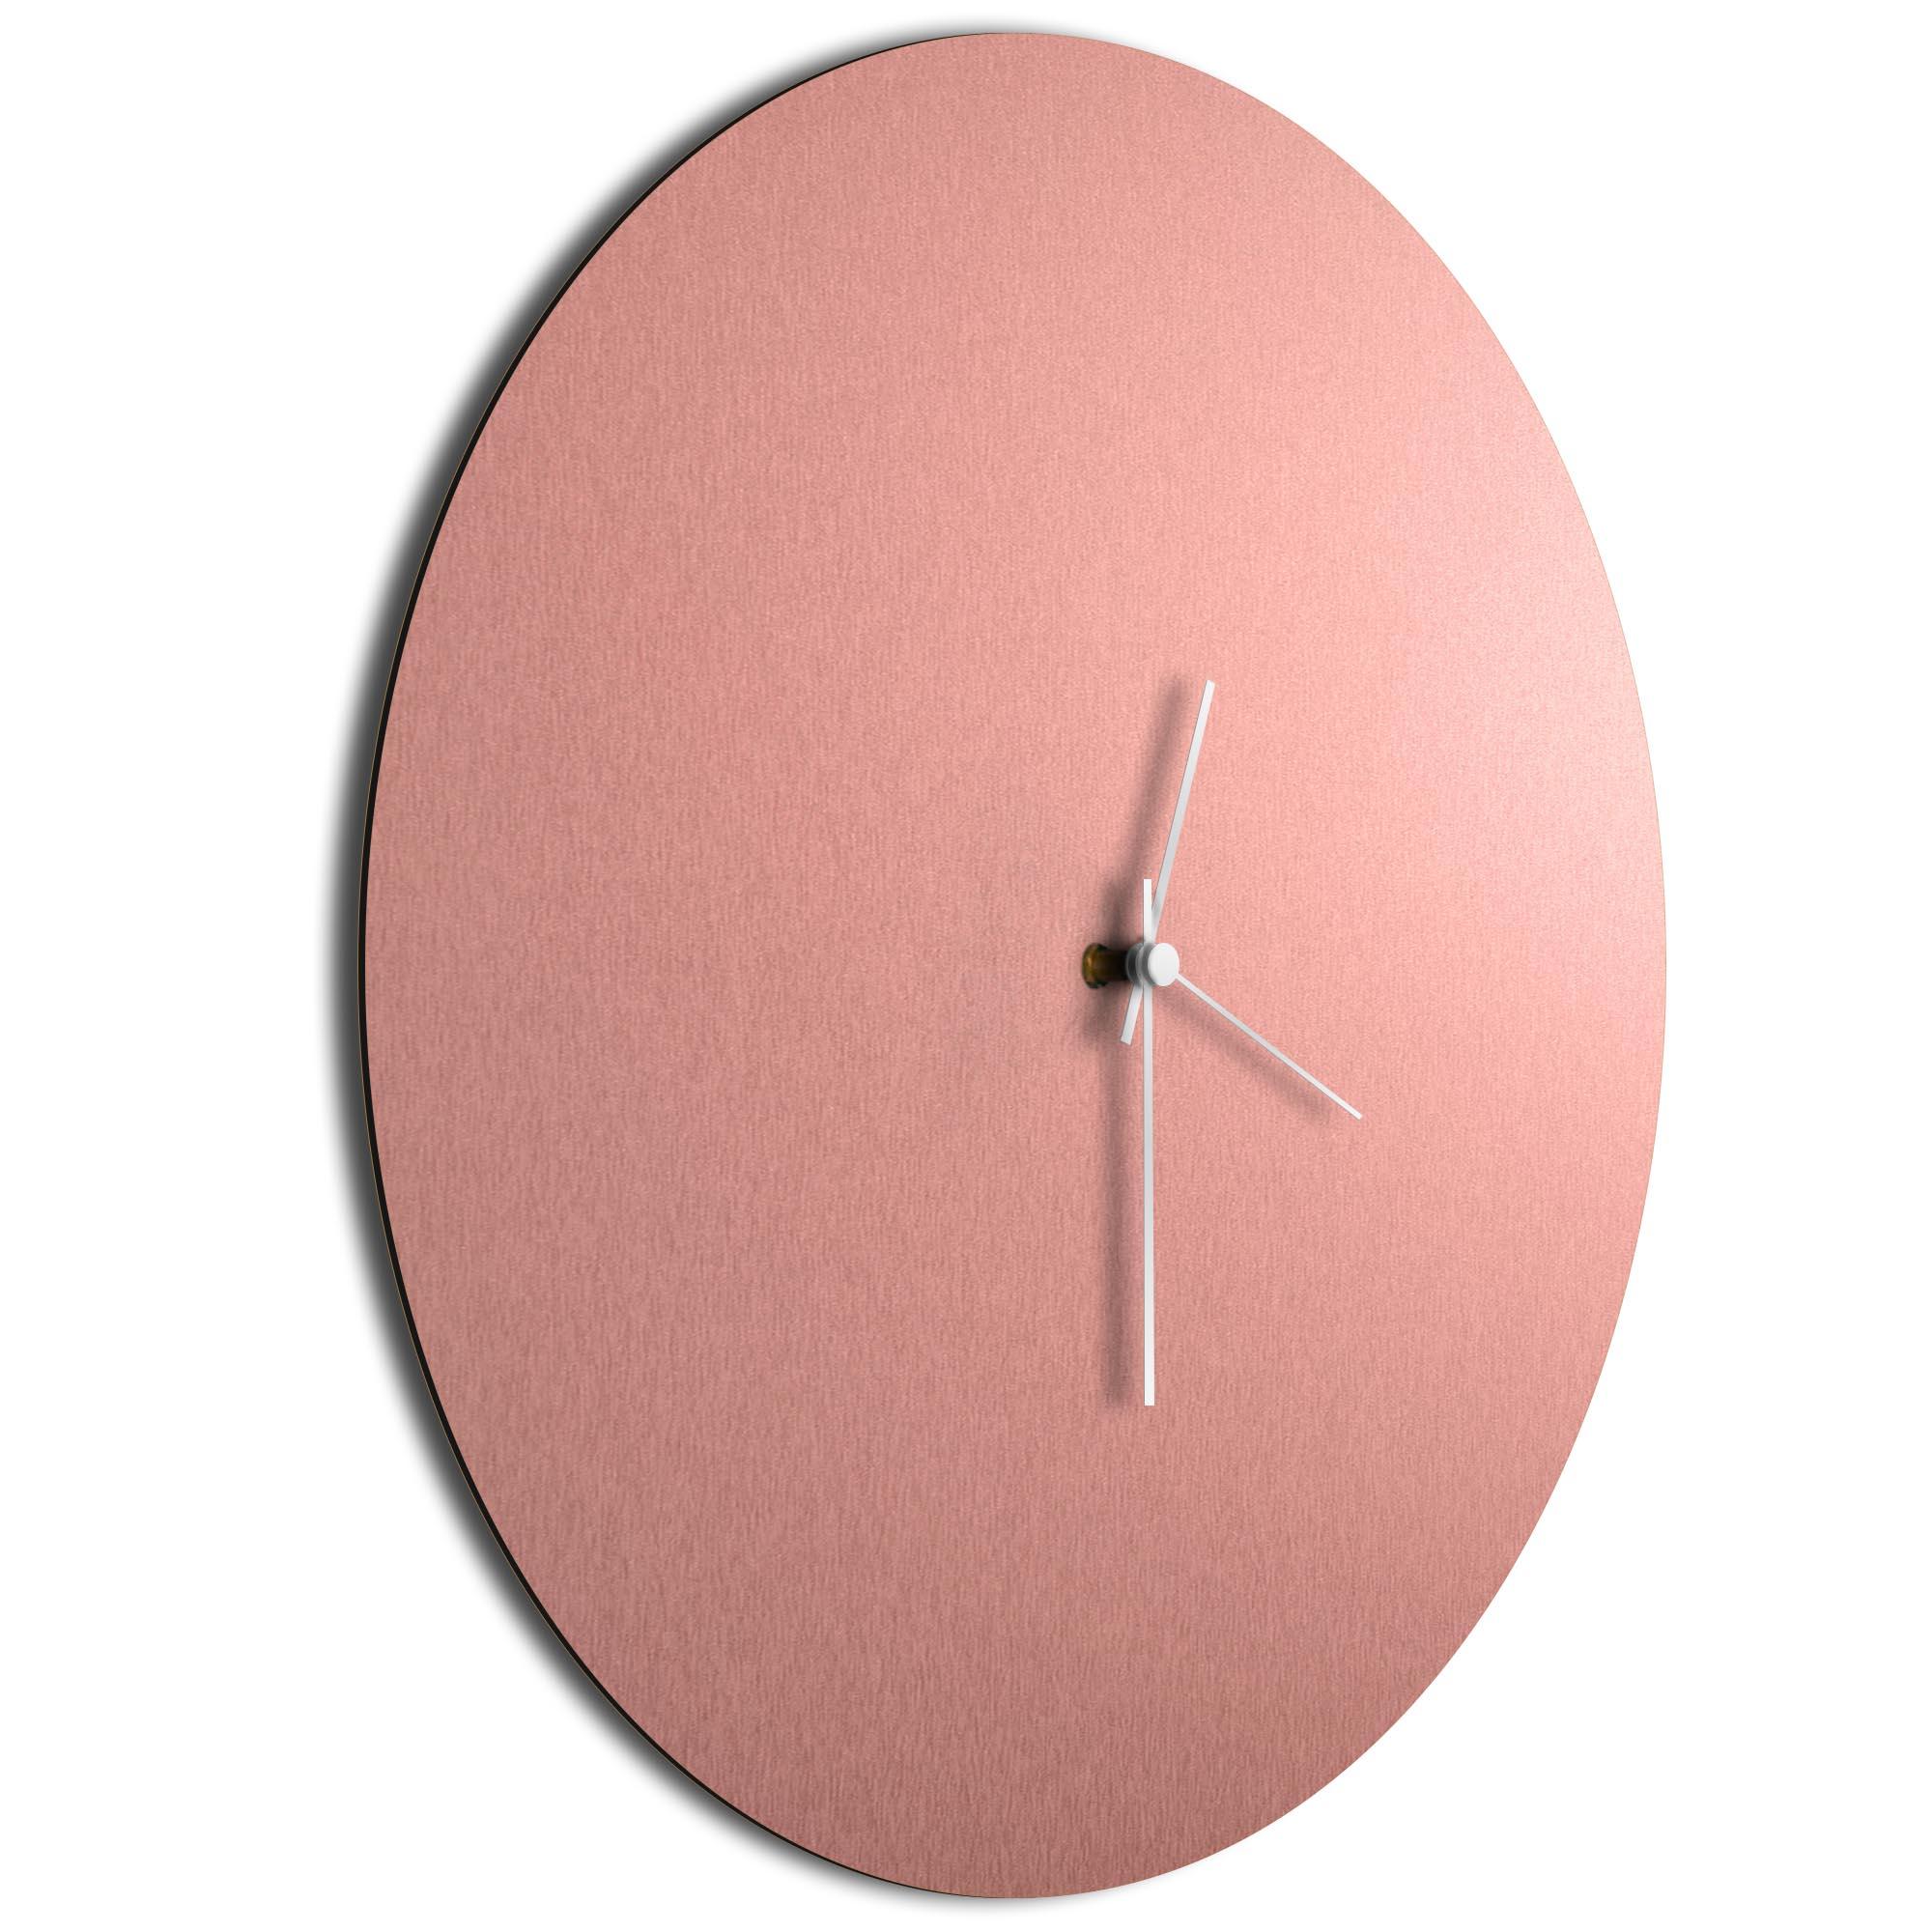 Coppersmith Circle Clock Large White - Image 2